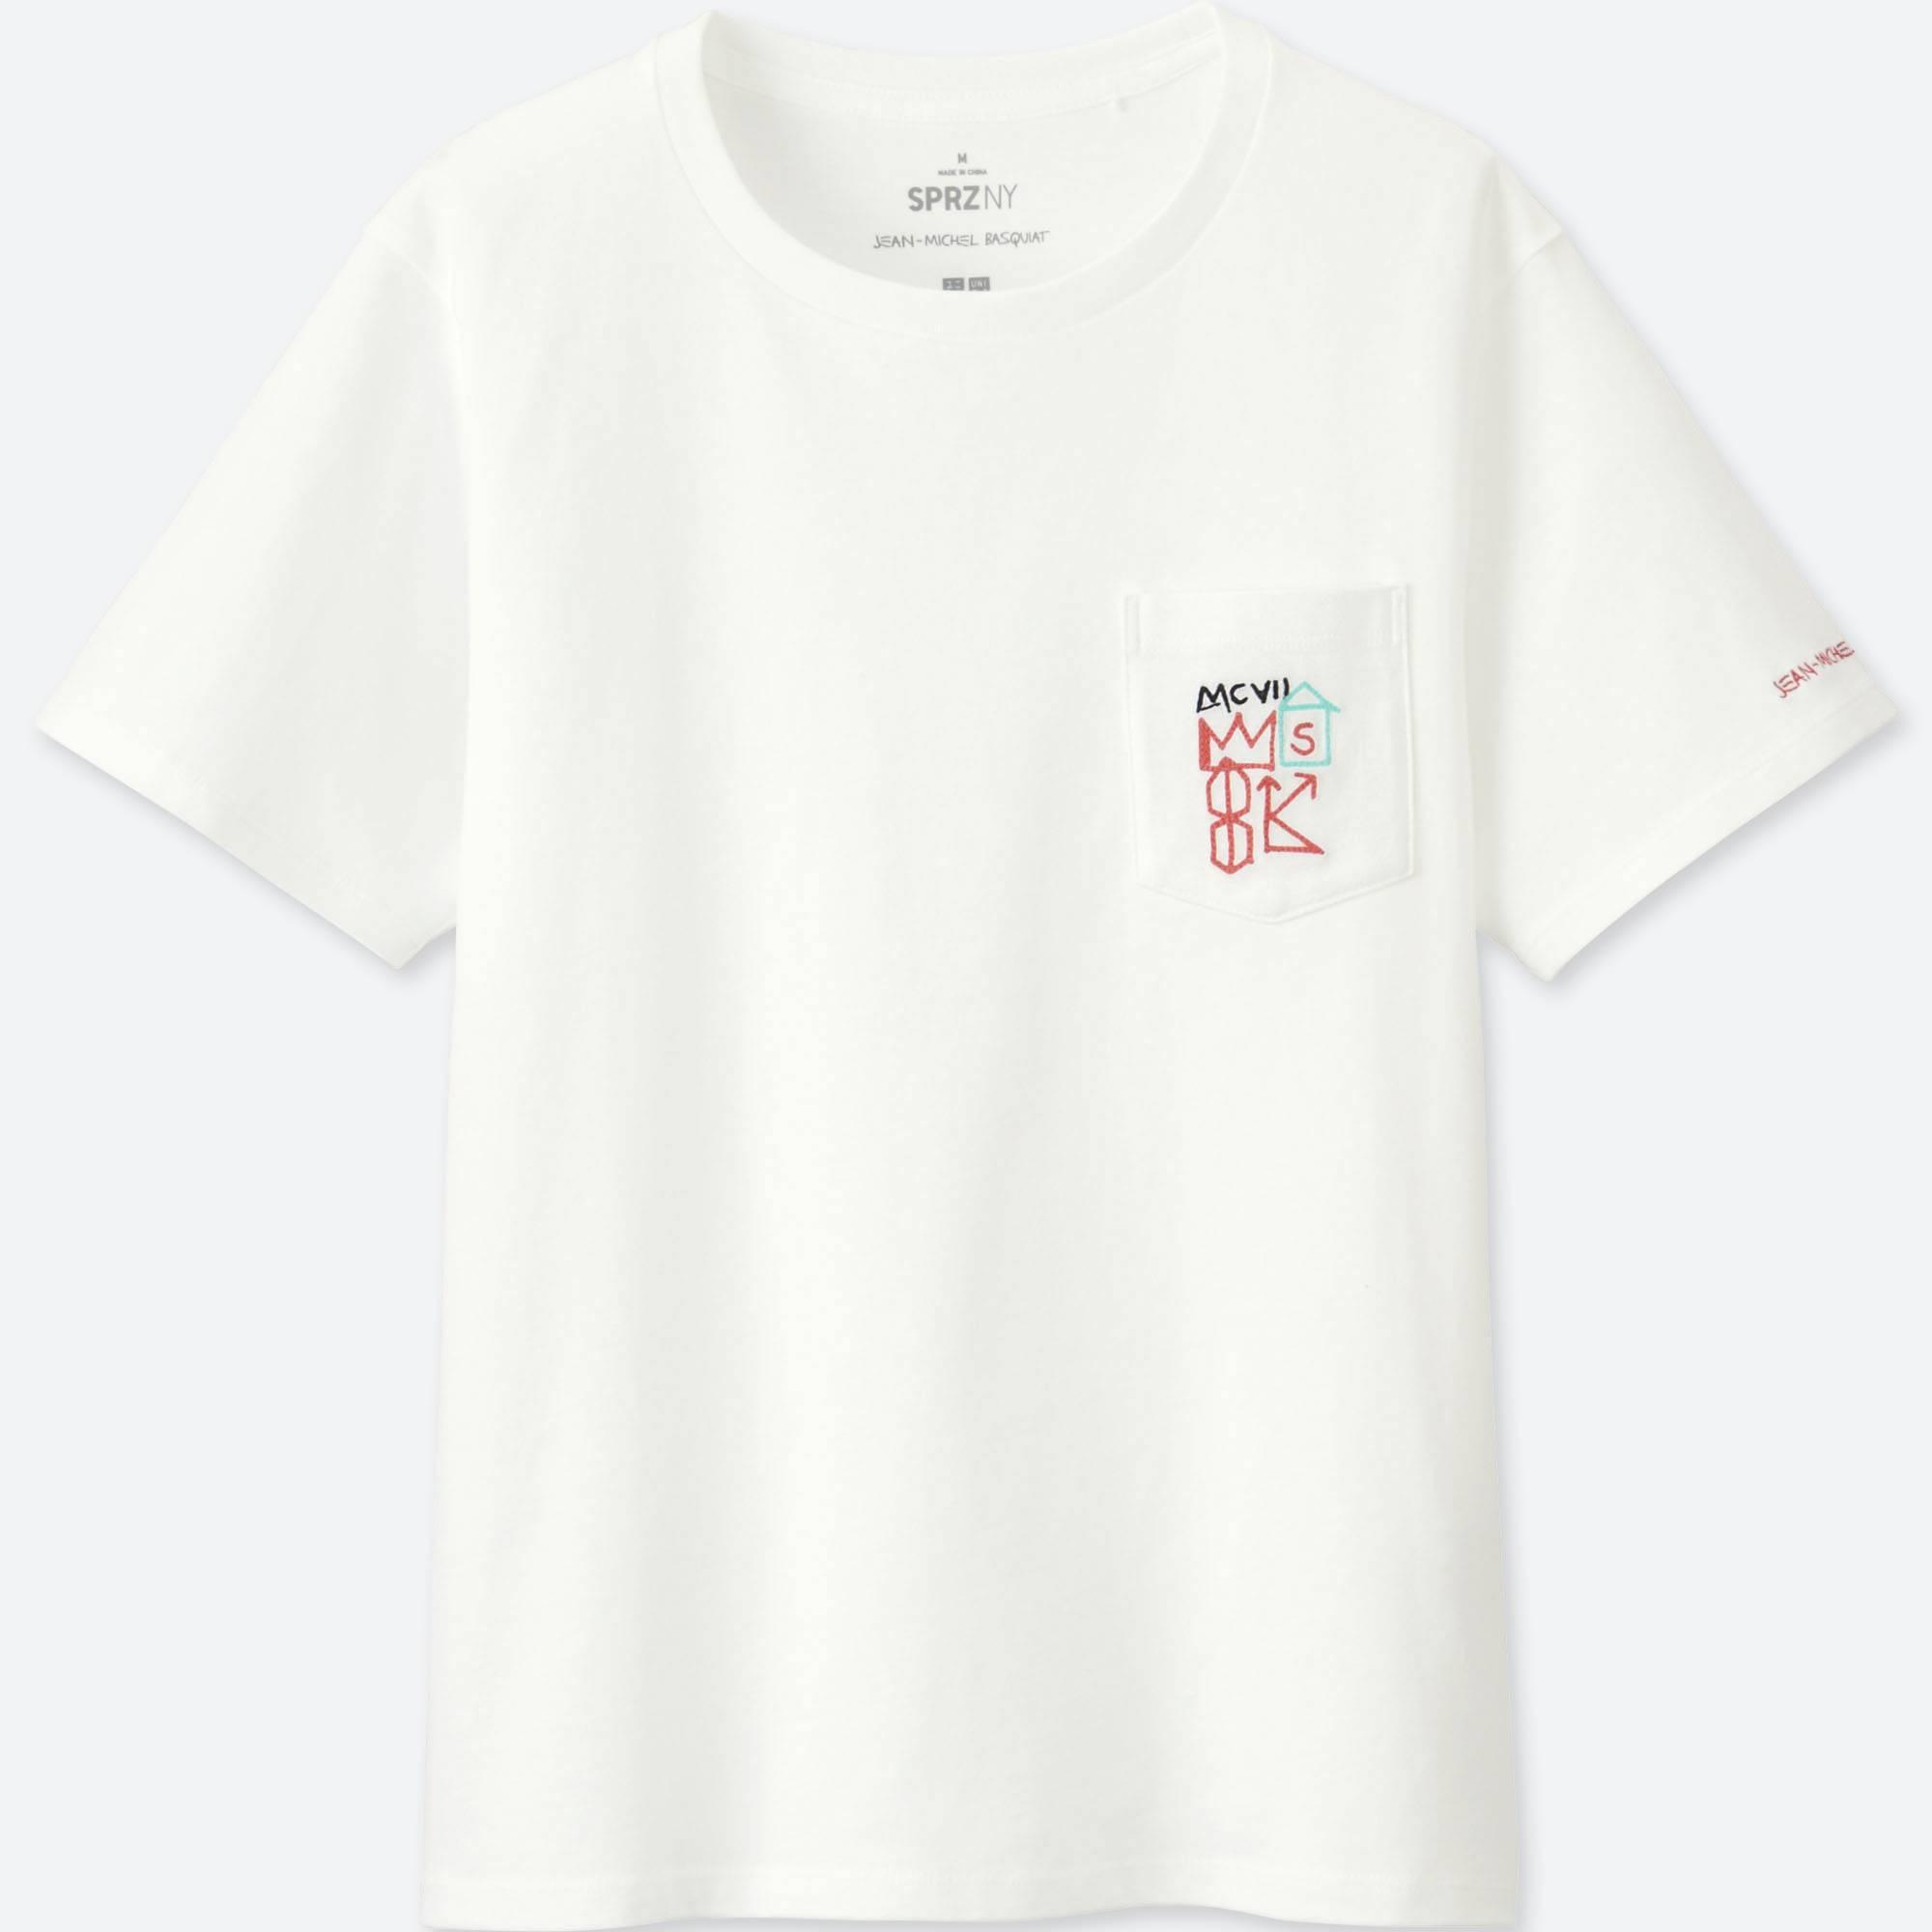 9650515b421e Lyst - Uniqlo Women Sprz Ny Graphic T-shirt (jean-michel Basquiat ...